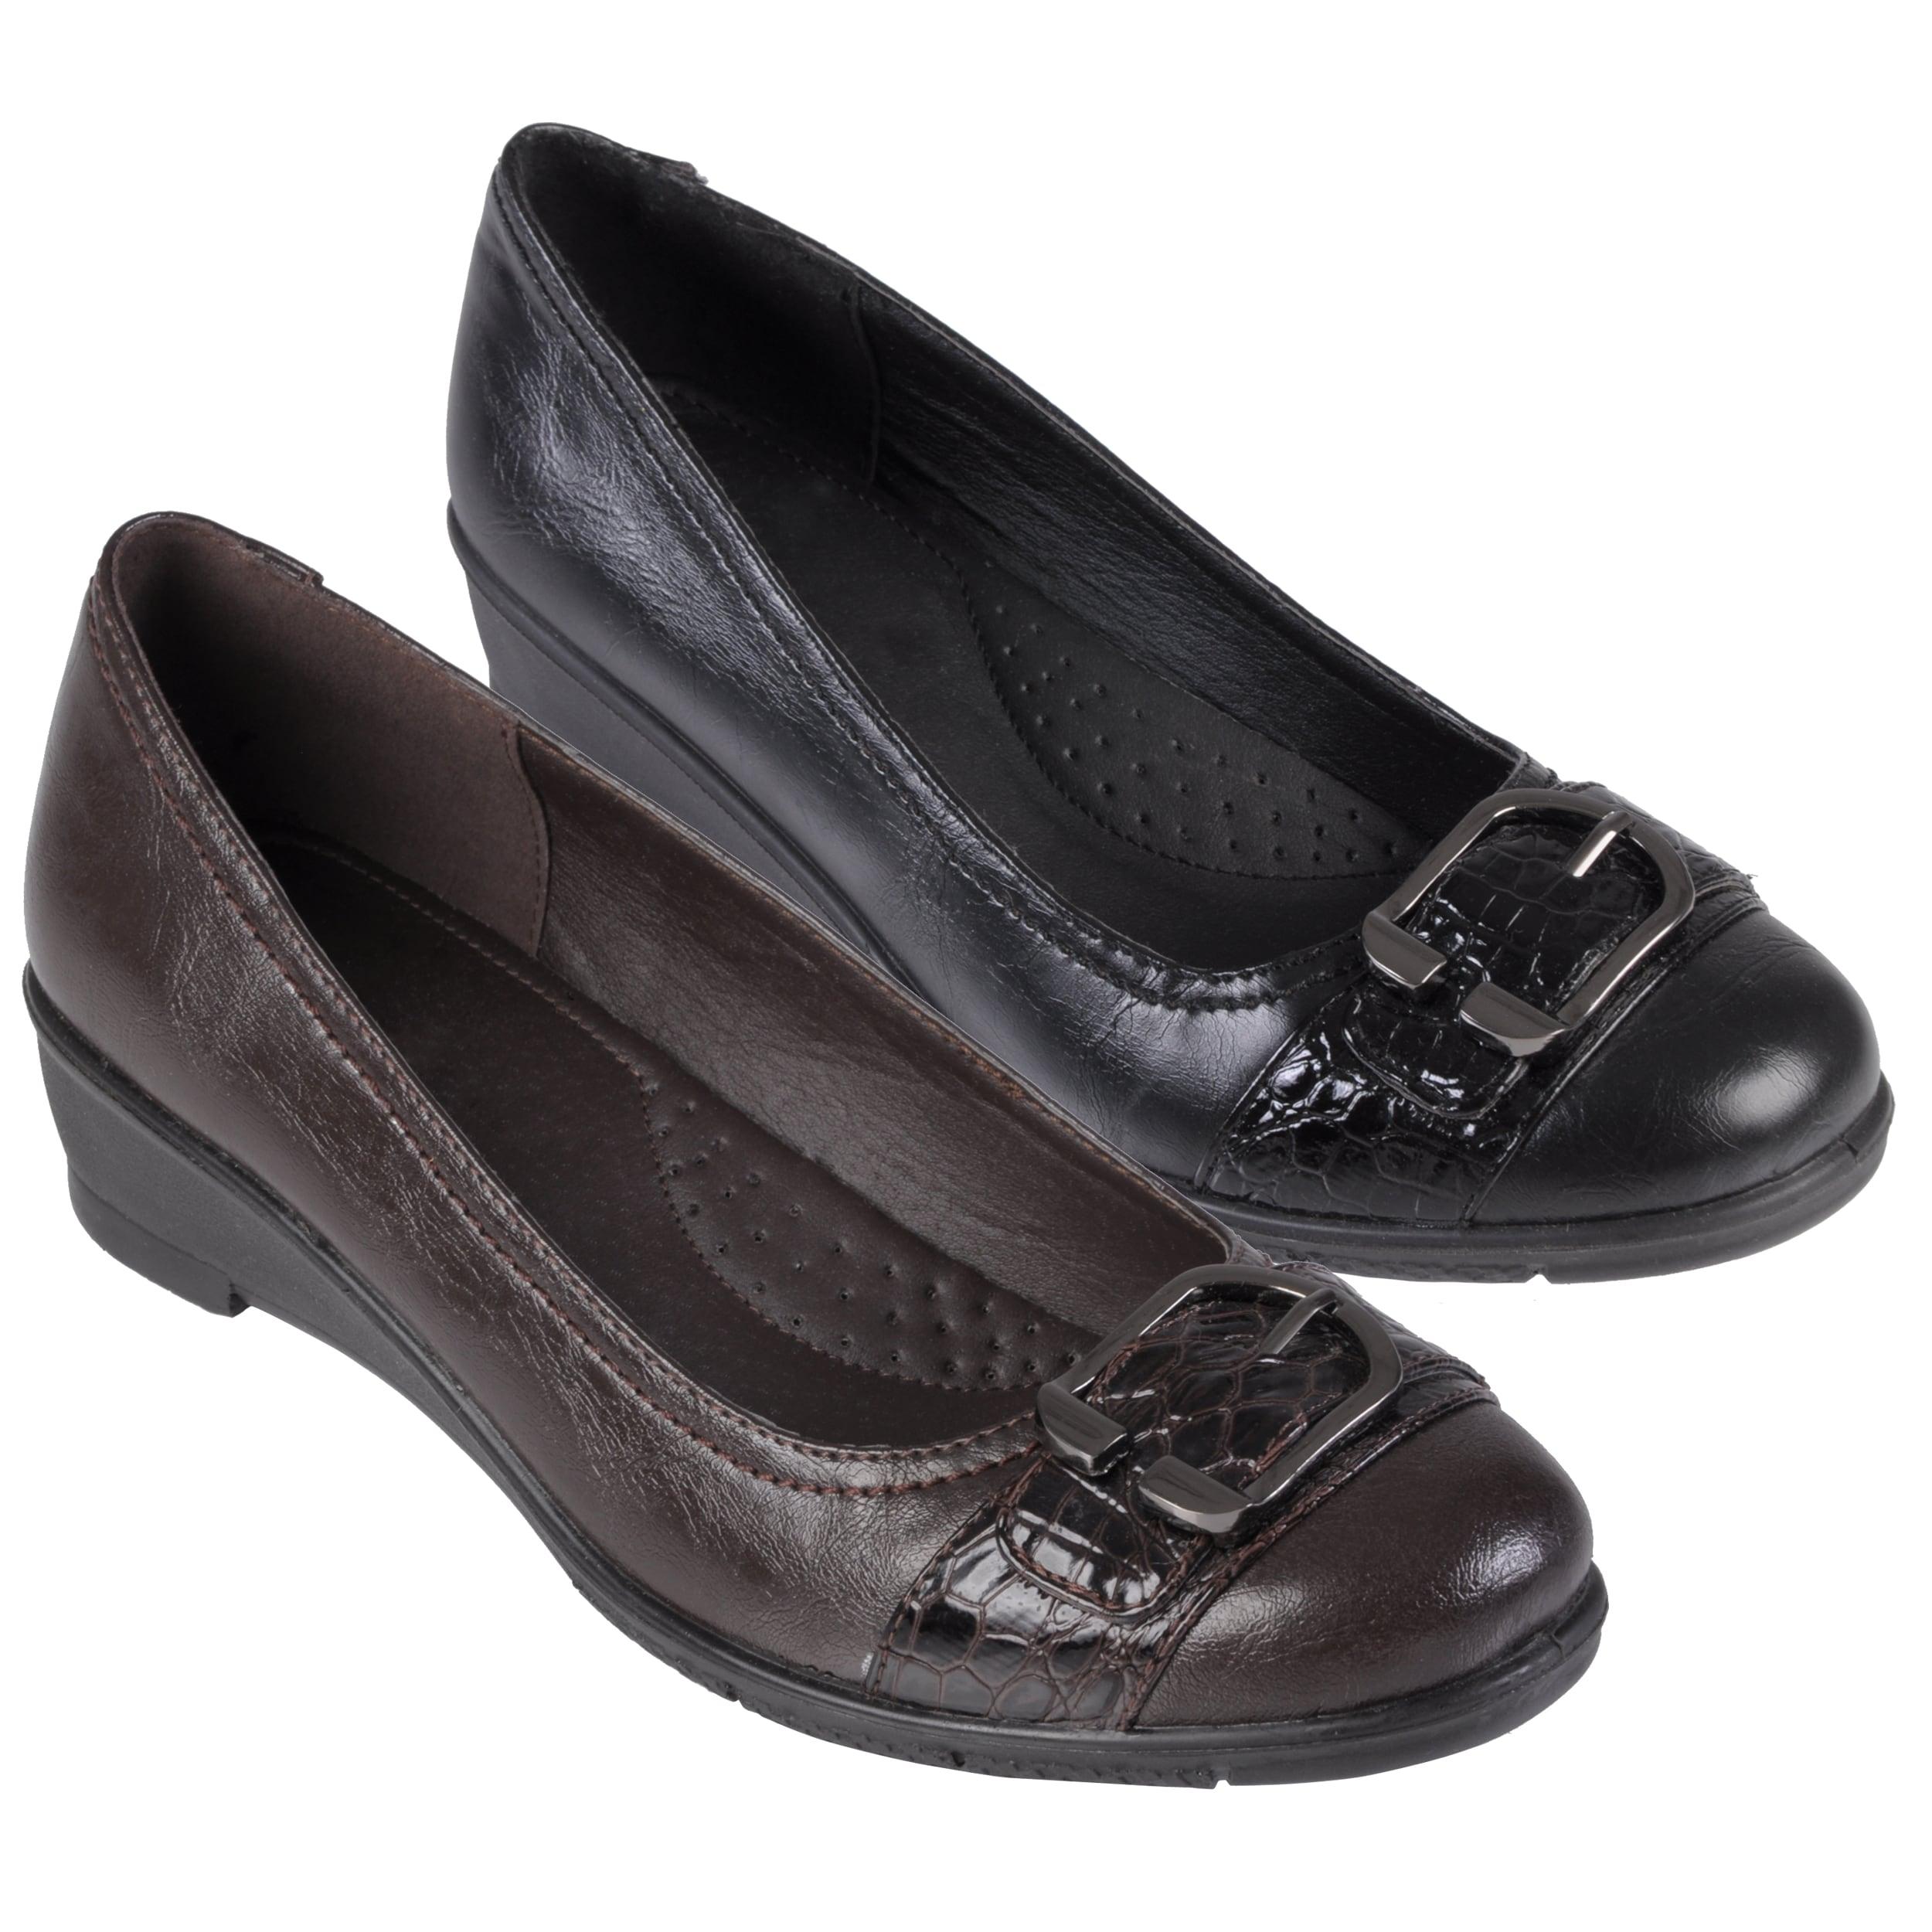 Journee Collection Women's 'Liz-1' Buckle Detail Almond Toe Loafer